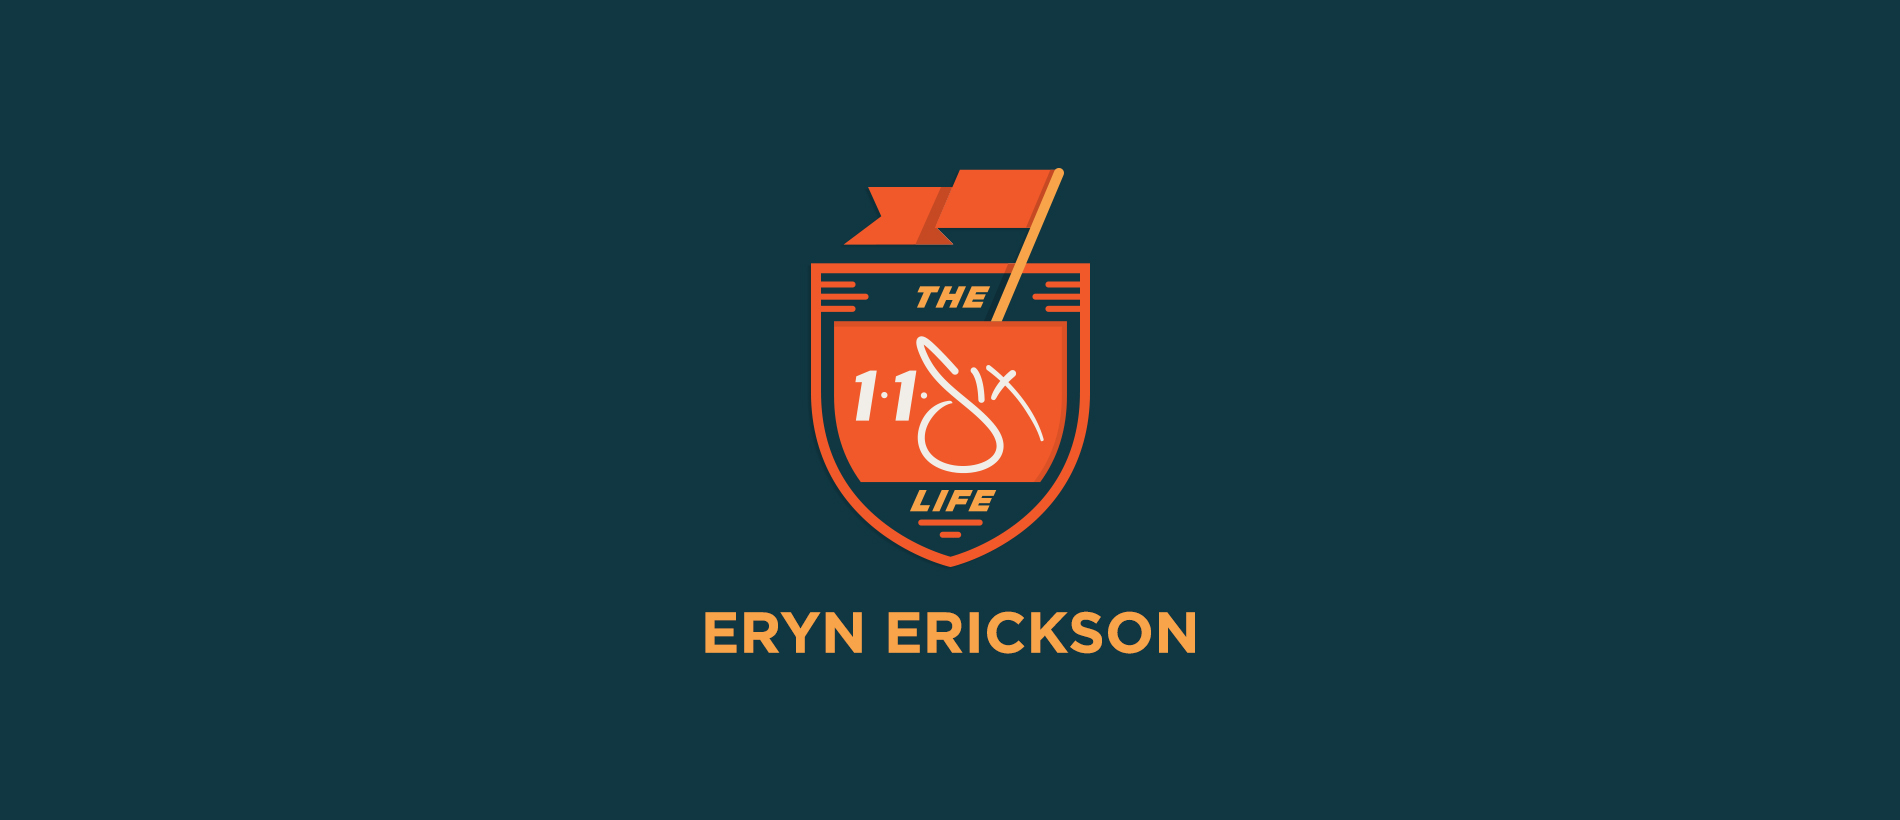 The 116 Life x Eryn Erickson